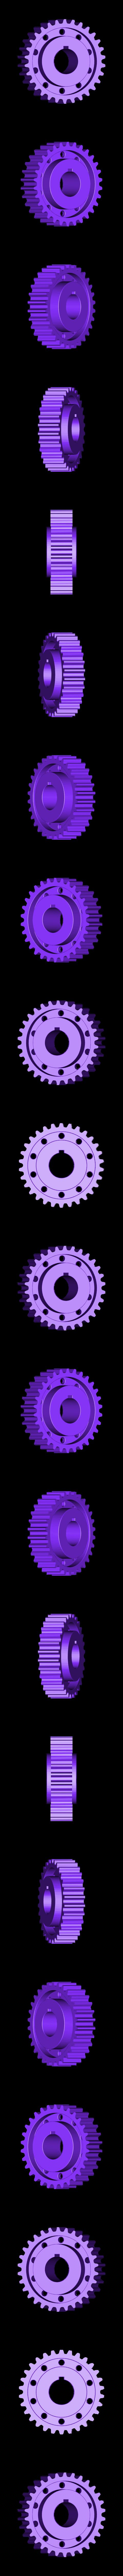 engranage.STL Download free STL file gear 30 teeth (gear 30 teeth) • 3D print design, jru